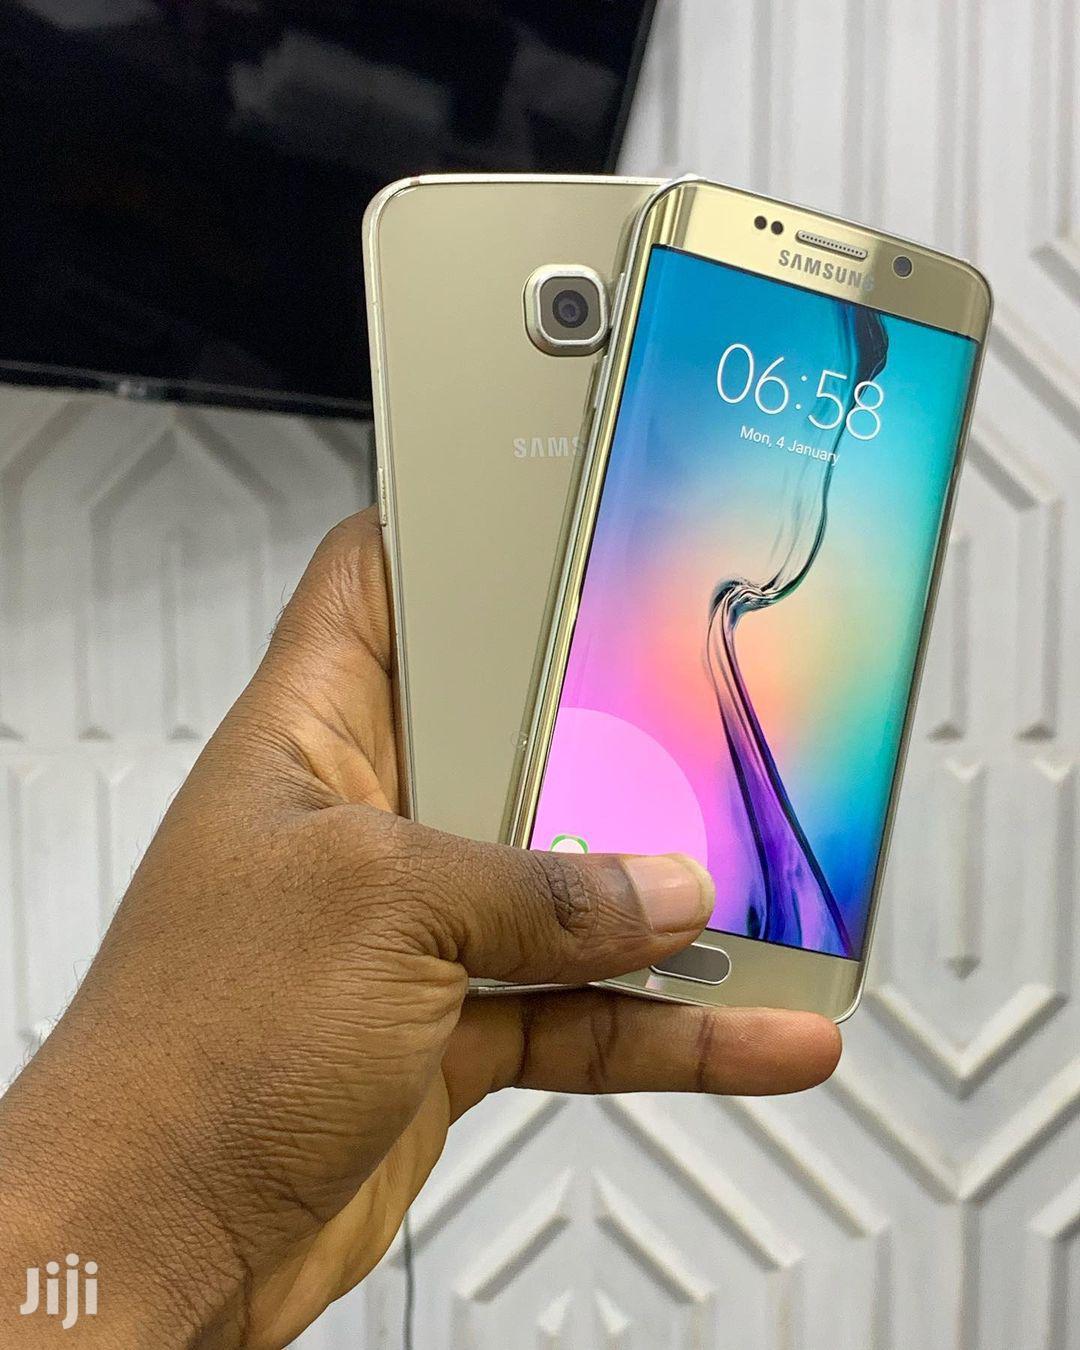 New Samsung Galaxy S6 edge 32 GB | Mobile Phones for sale in Ilala, Dar es Salaam, Tanzania